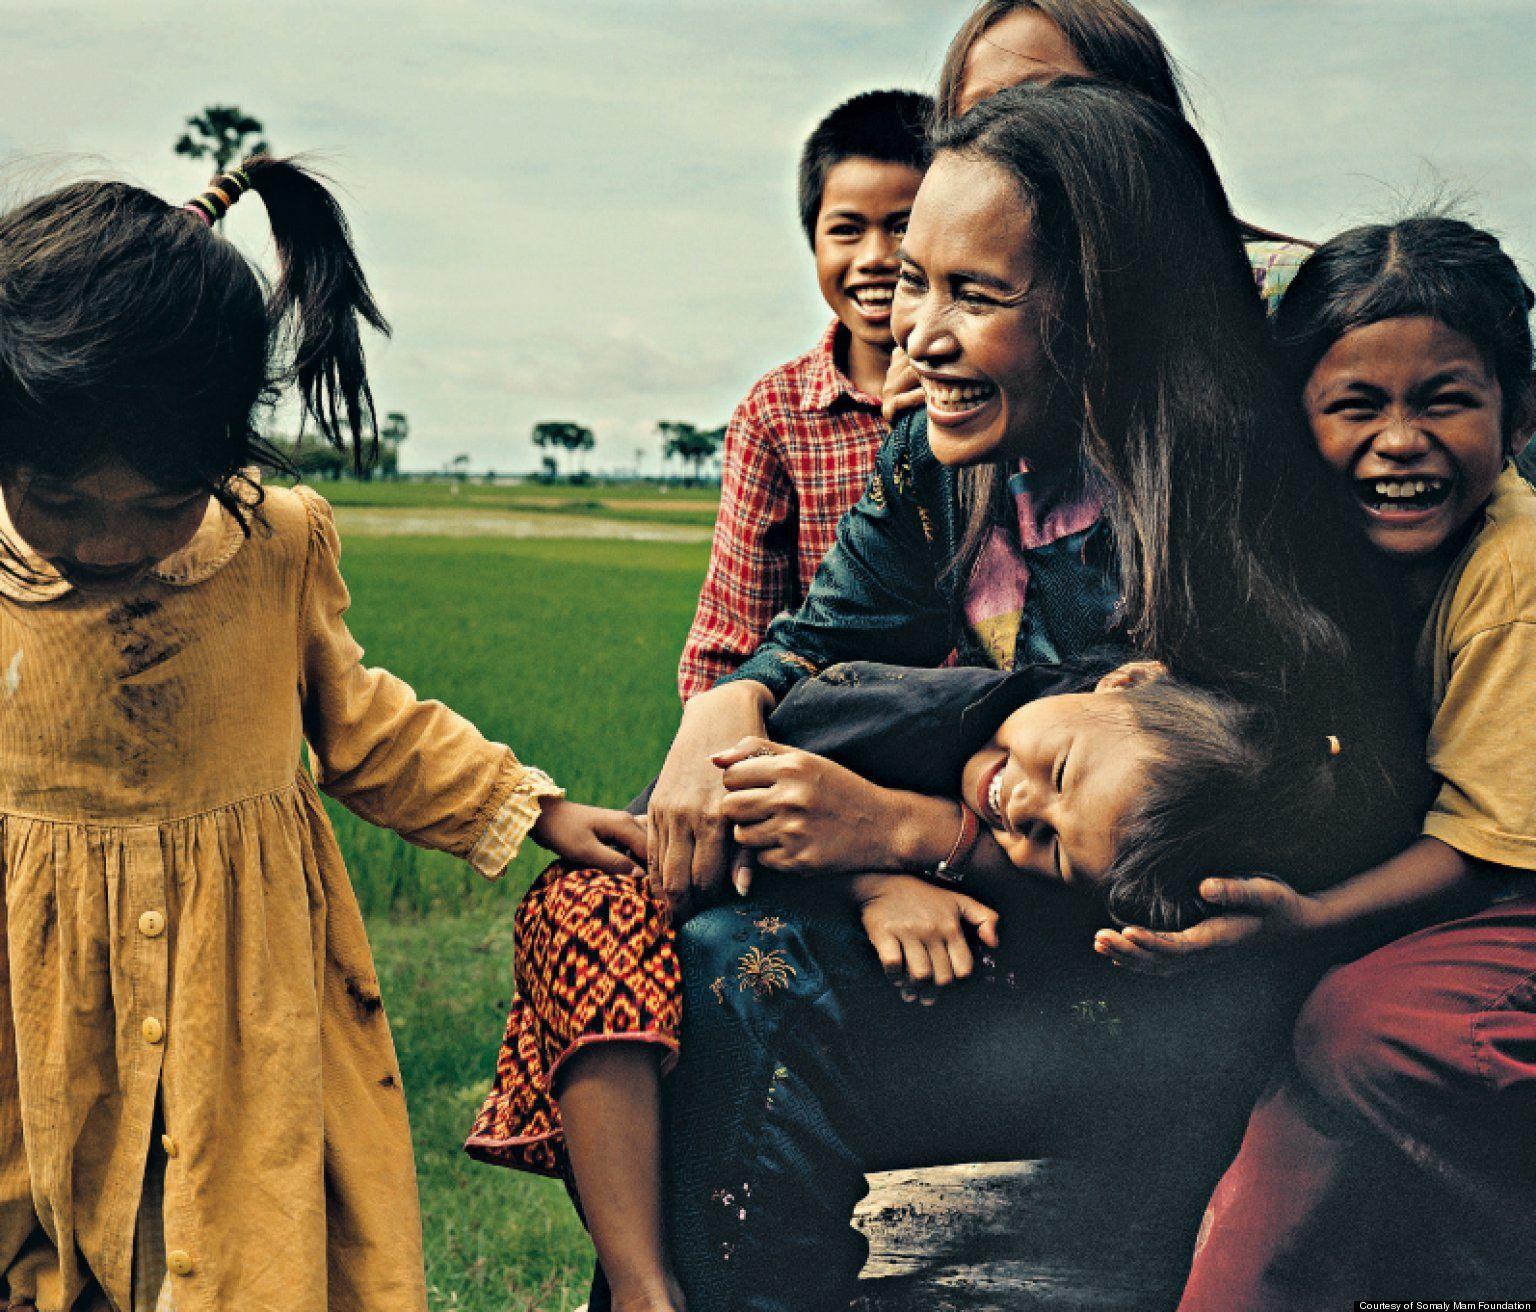 Cambodian village has disturbing reputation for child sex slavery